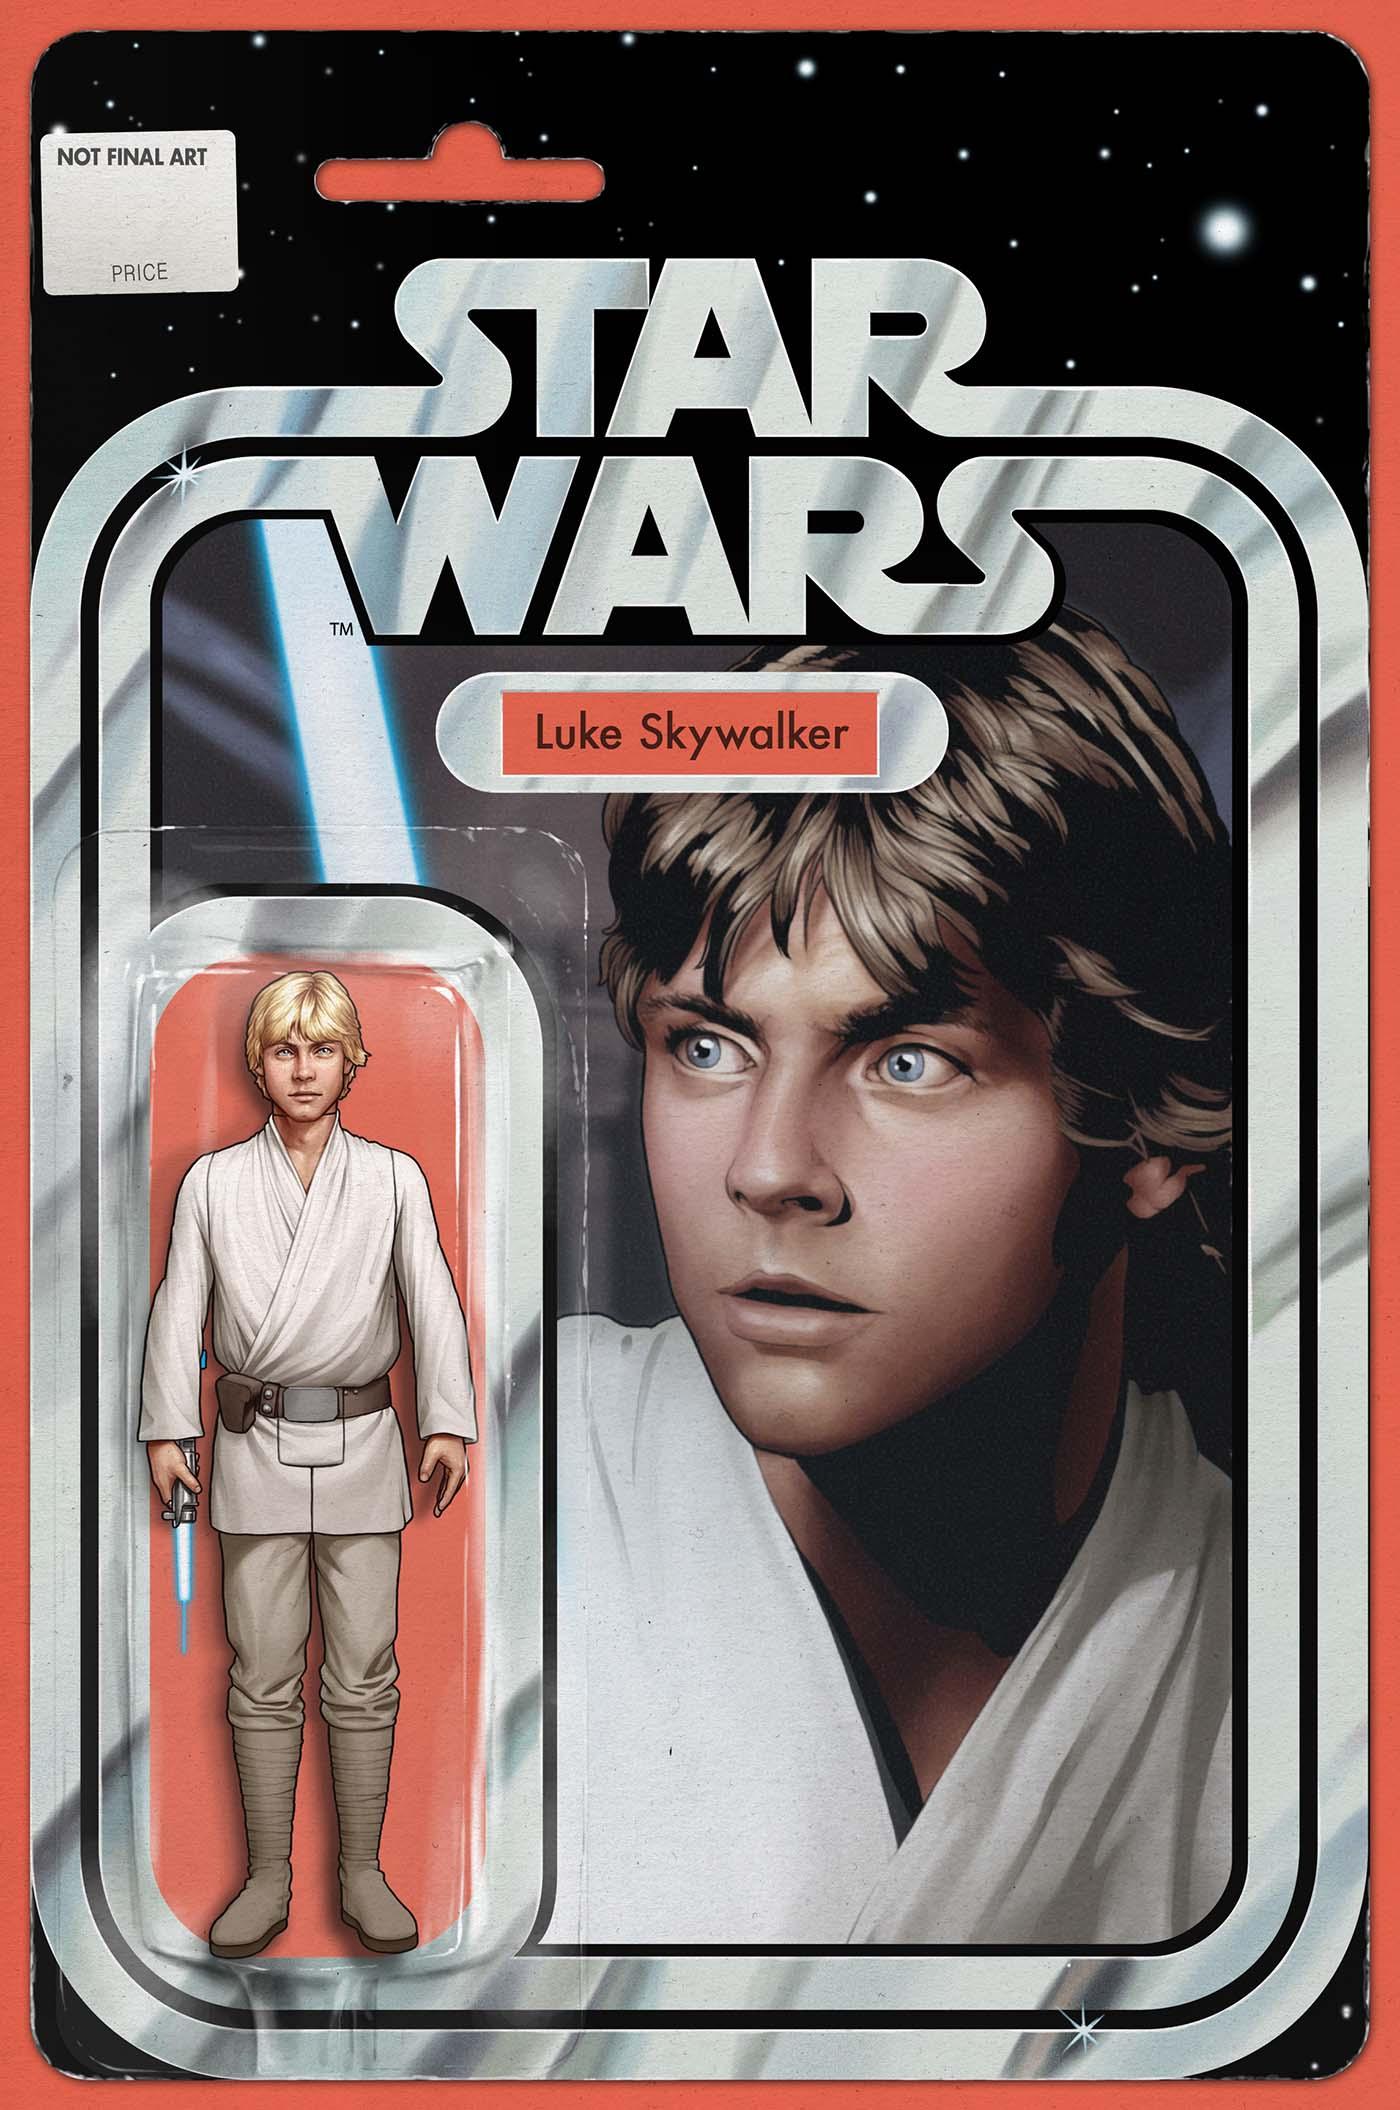 Star_Wars_1_Christopher_Action_Figure_Variant.jpg